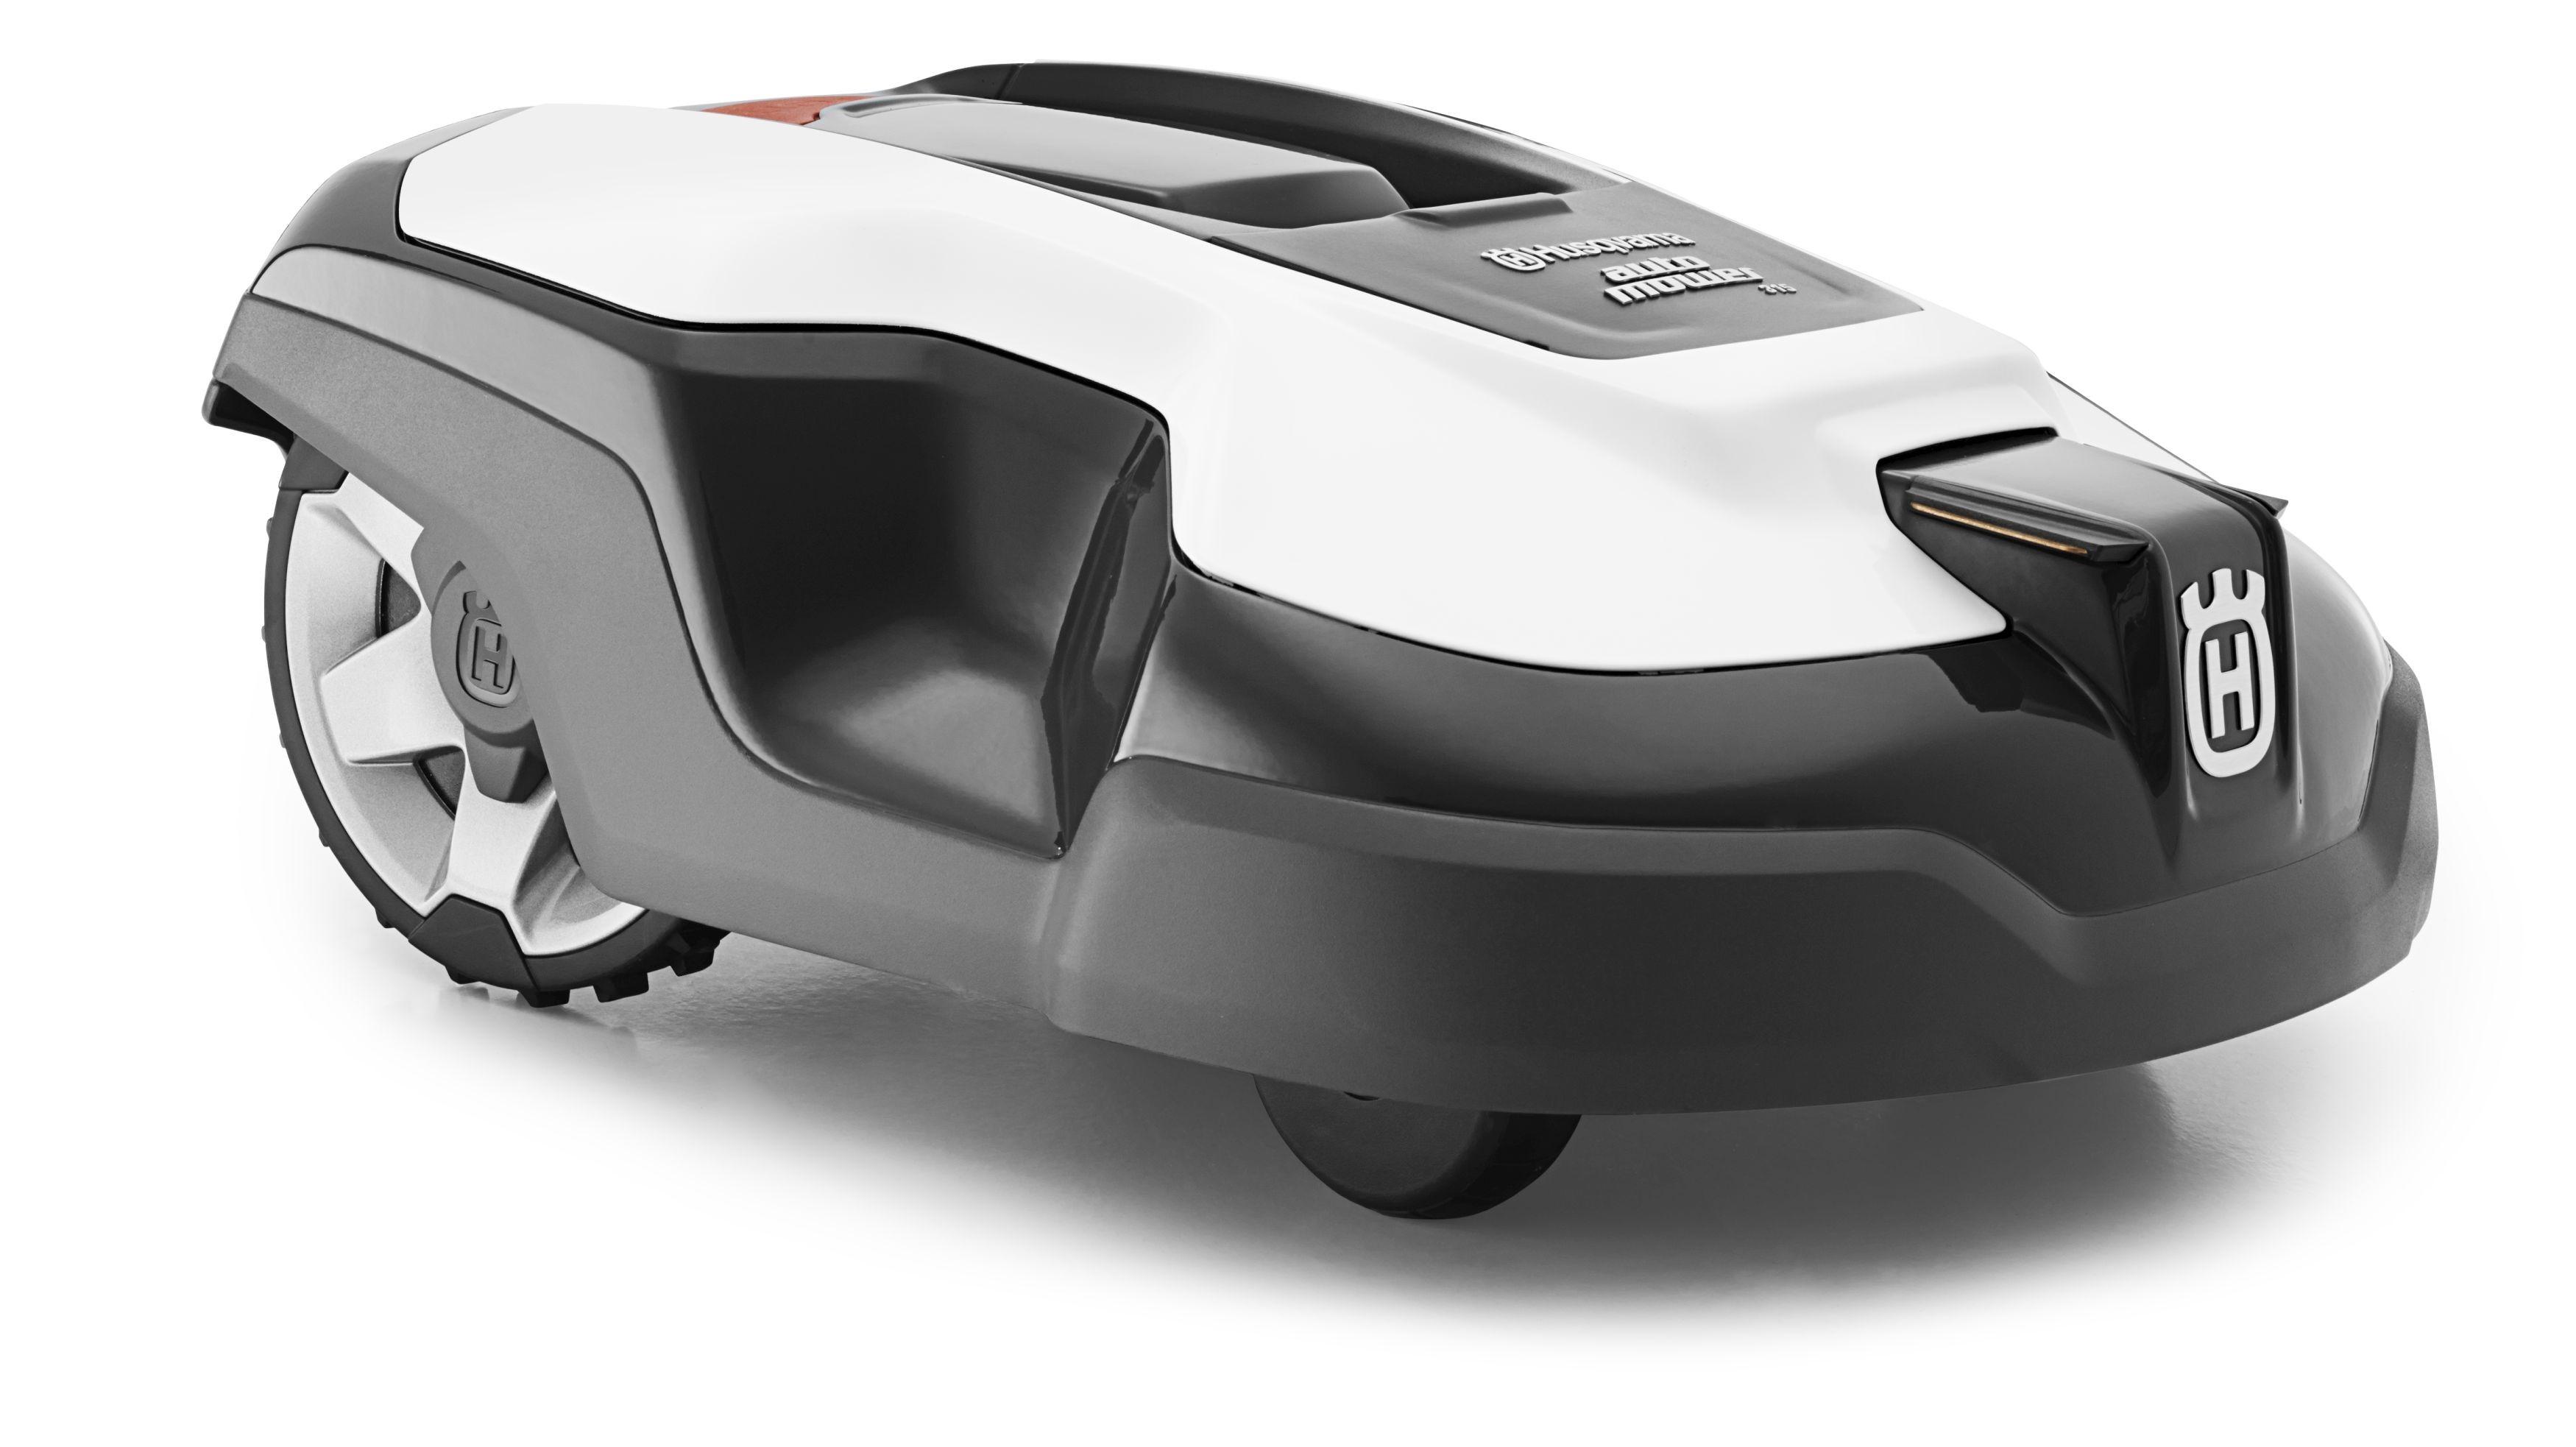 husqvarna automower husqvarna 310 automower. Black Bedroom Furniture Sets. Home Design Ideas